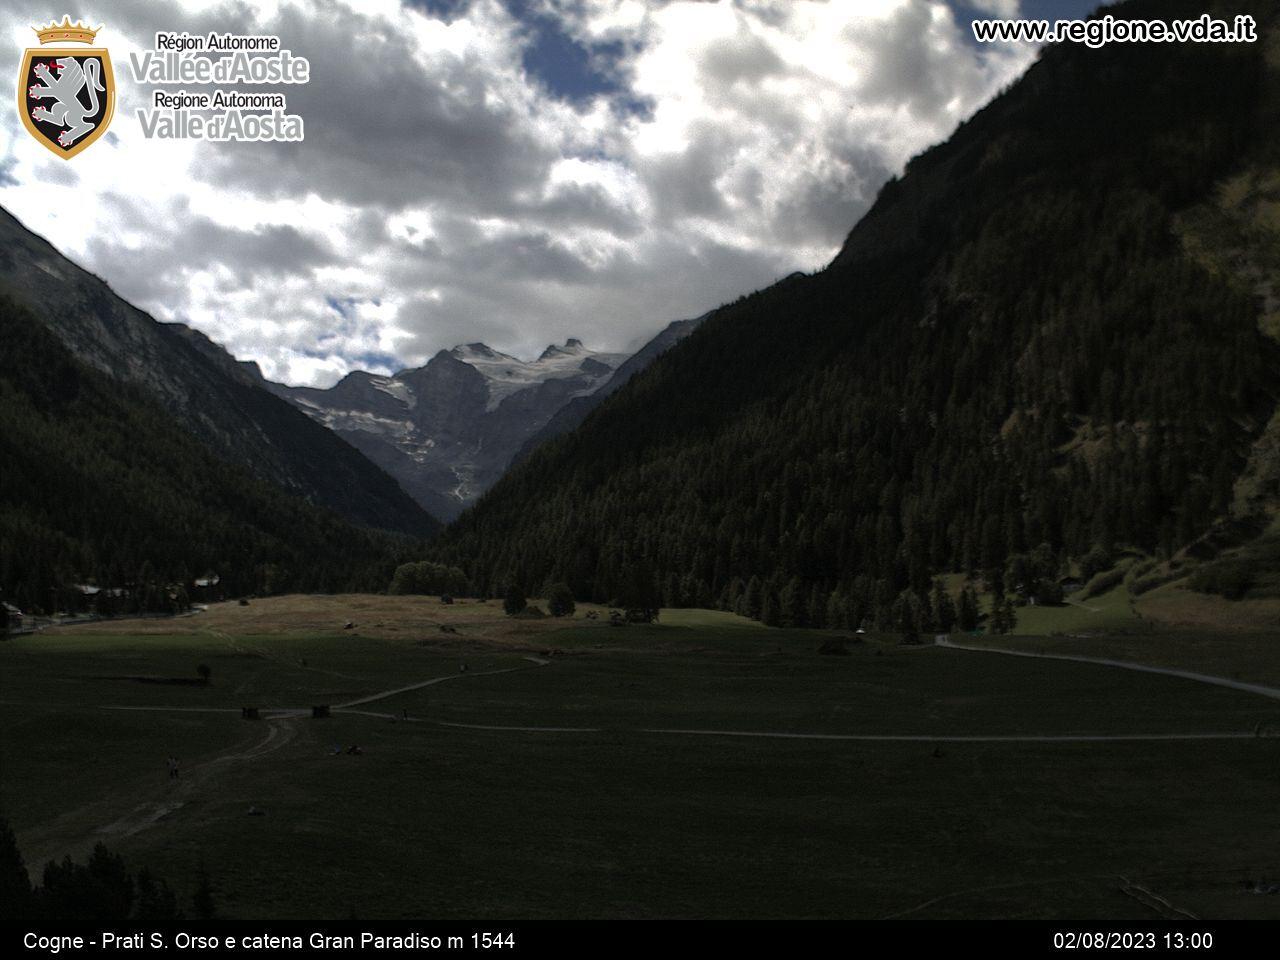 Webcam da Cogne verso Valnontey - Gran Paradiso sullo sfondo